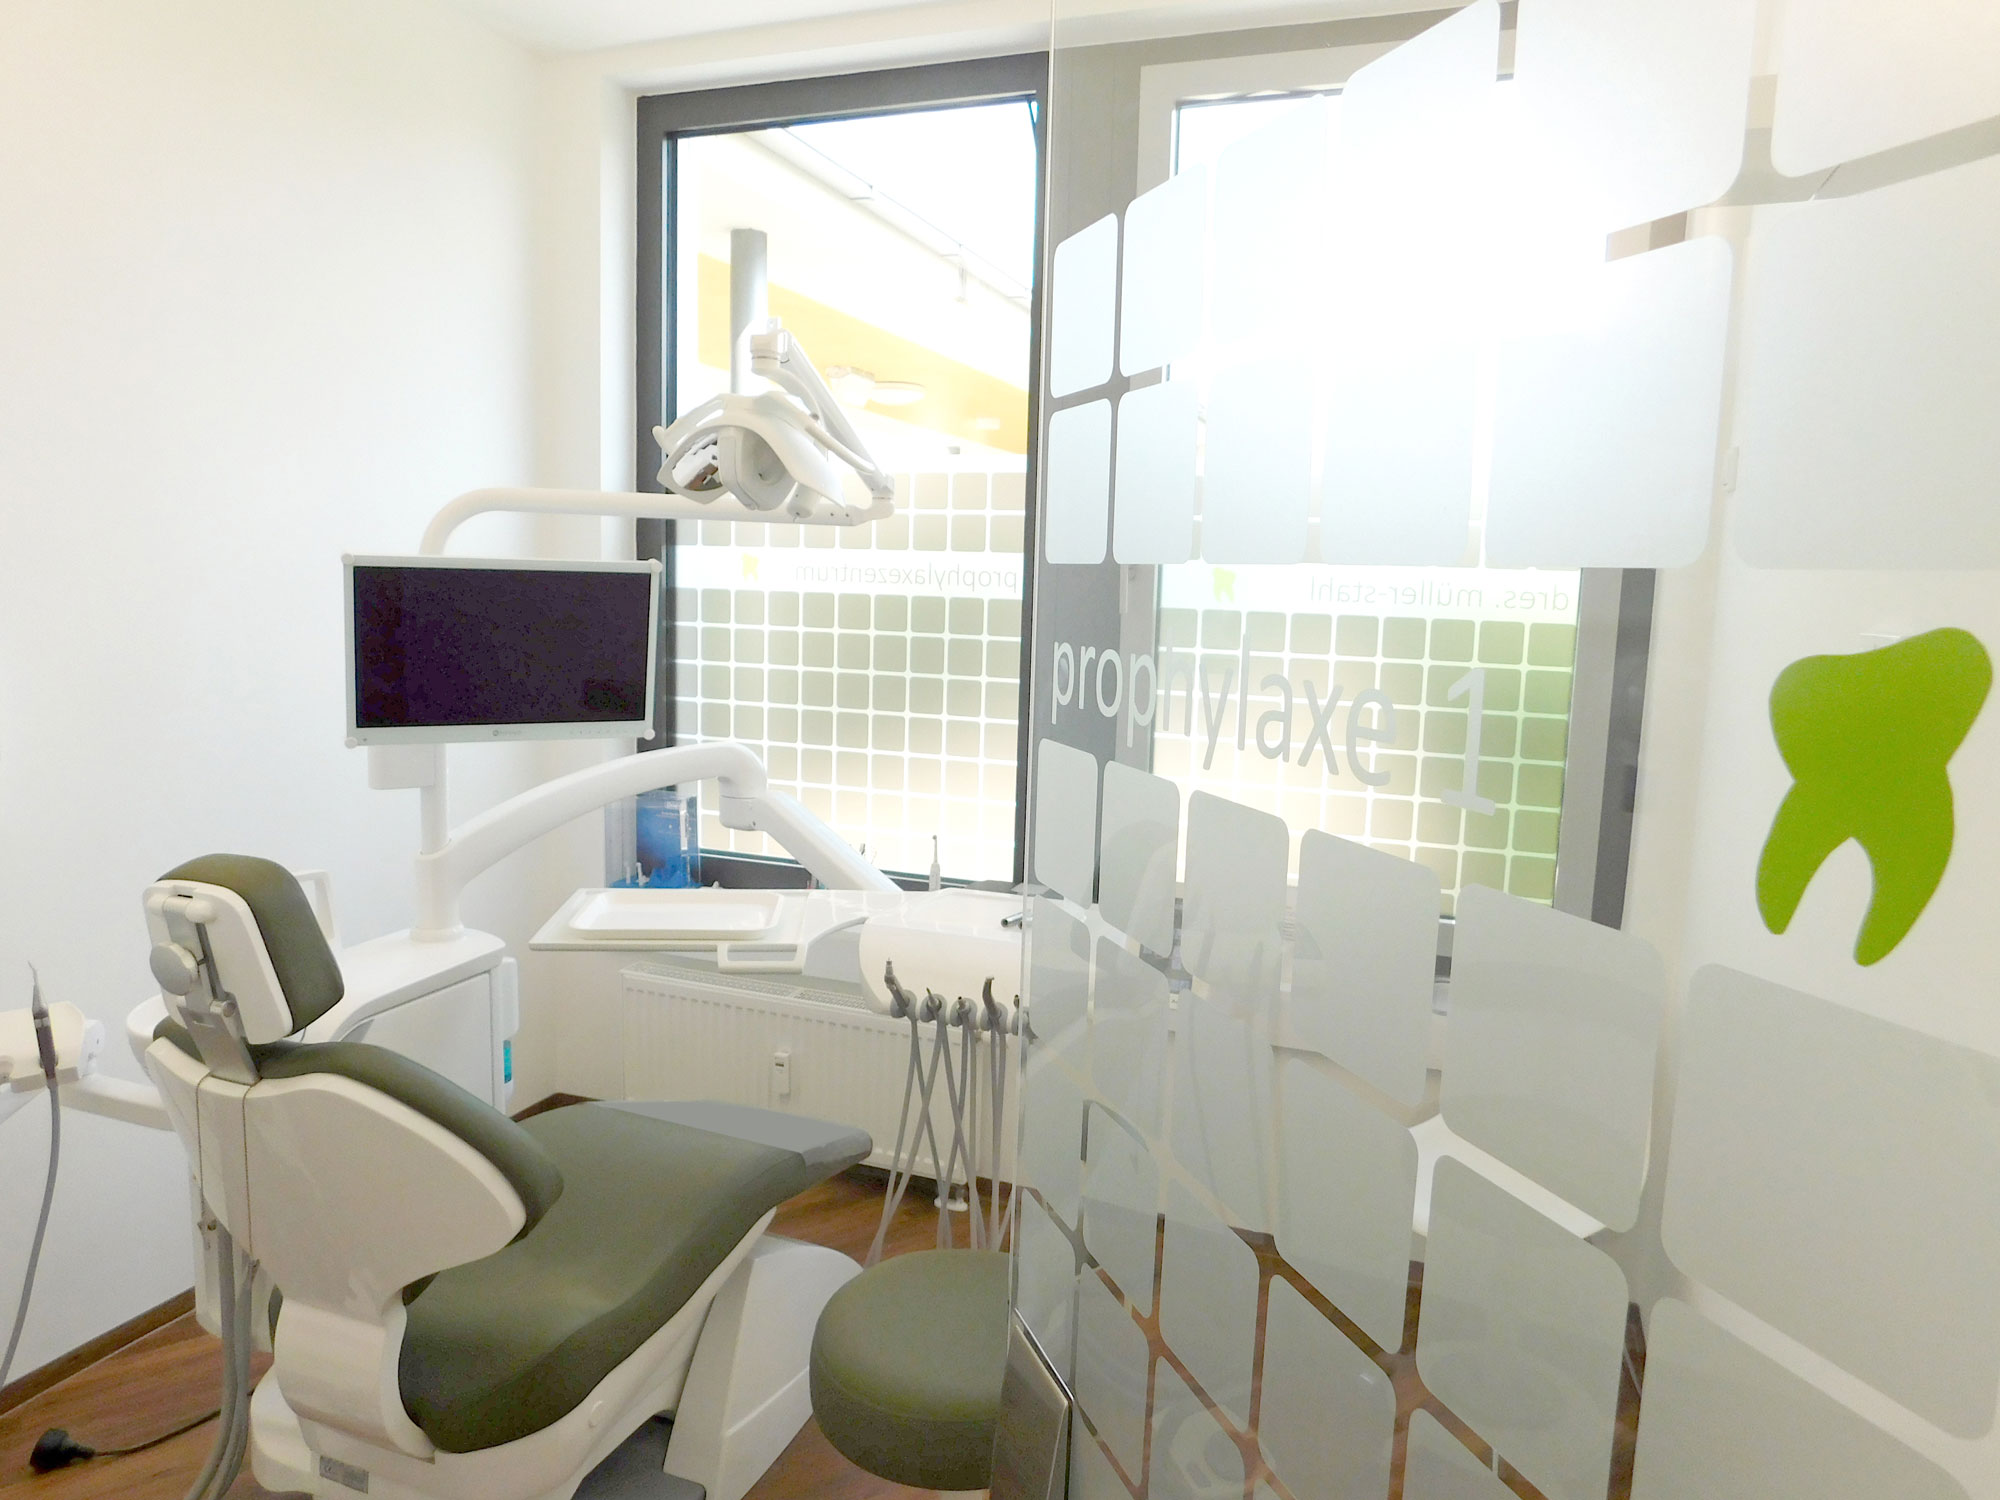 Dr Müller Stahl - Prophylaxezentrum